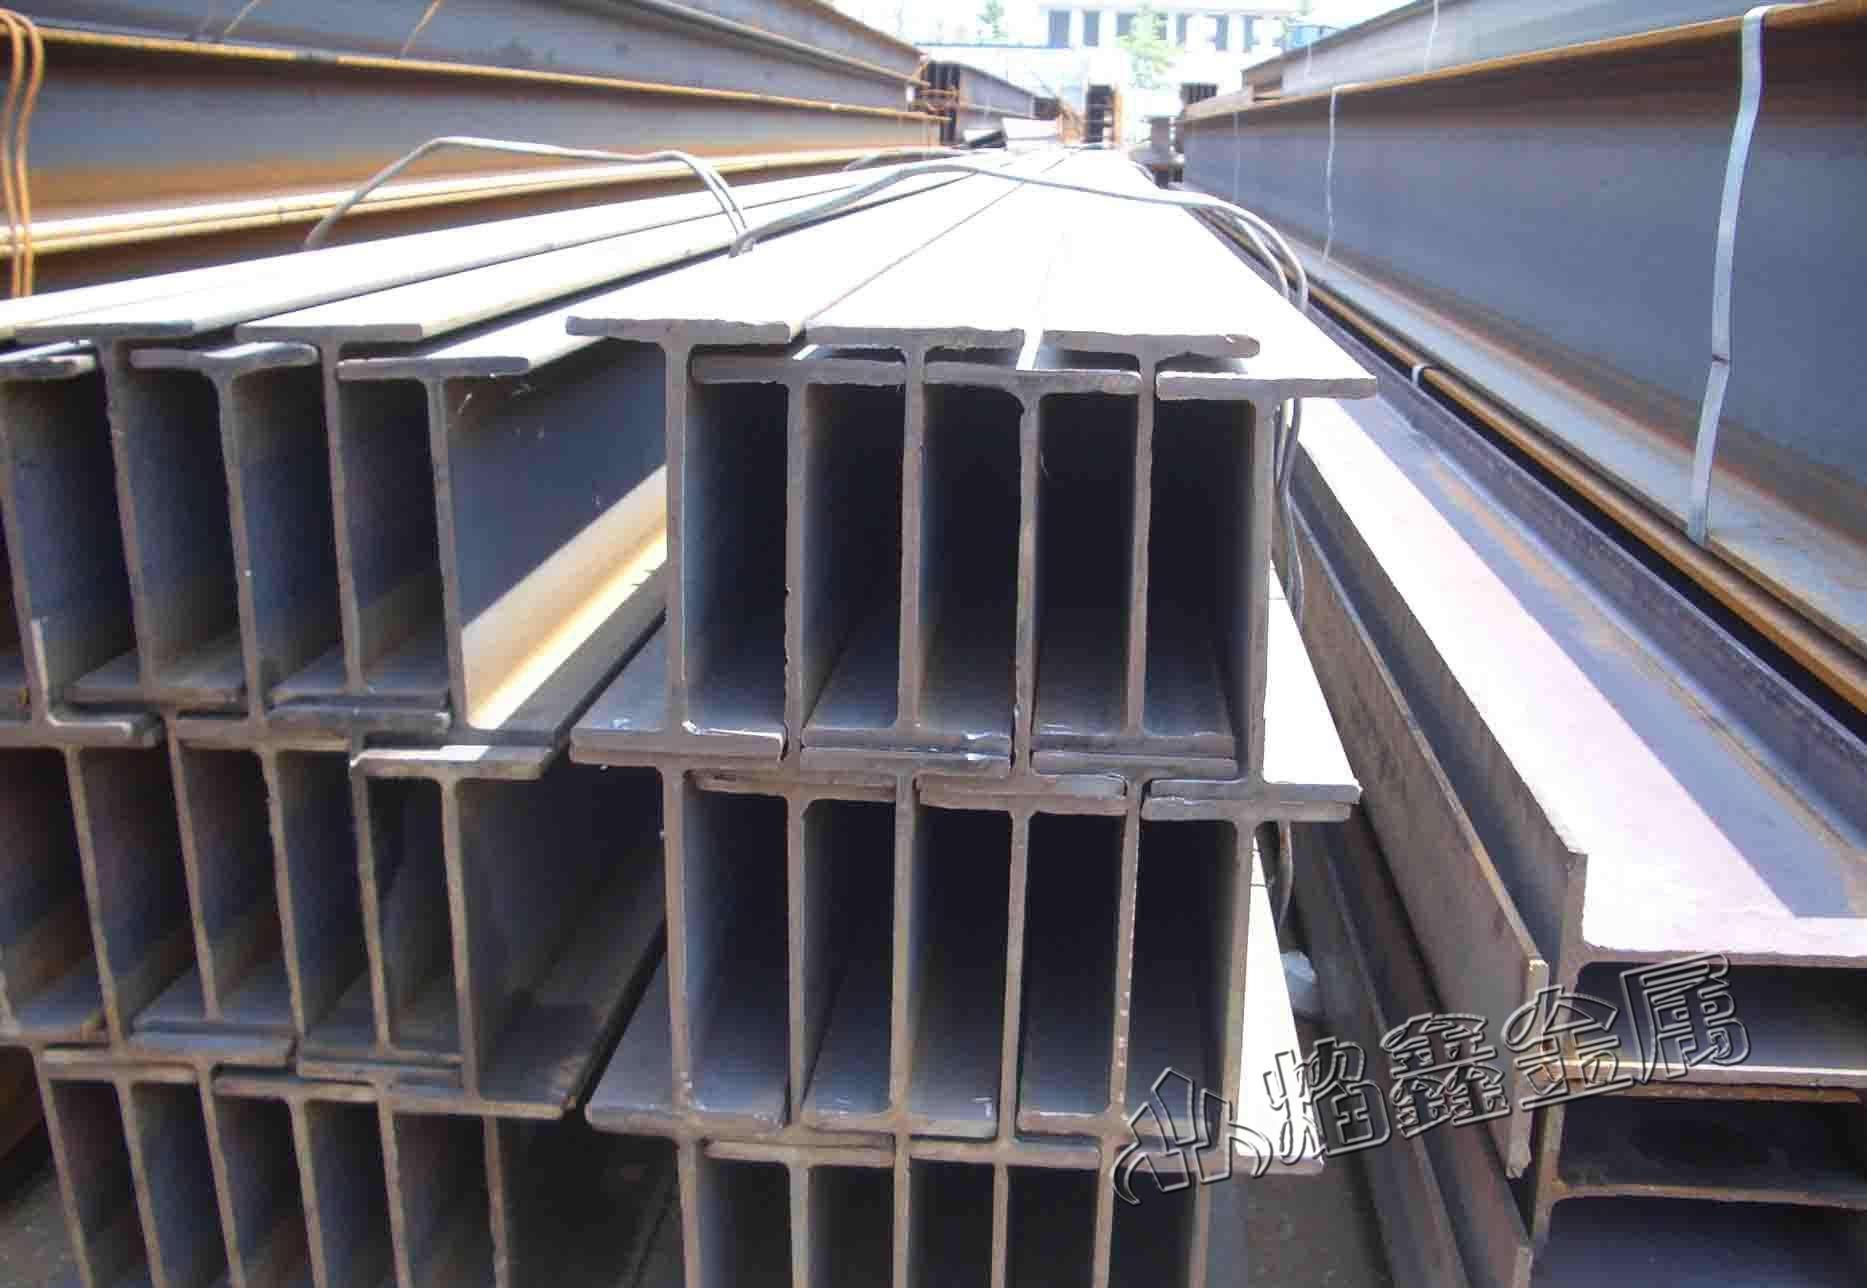 h 型钢主要用于工业与民用结构中的梁,柱构件.